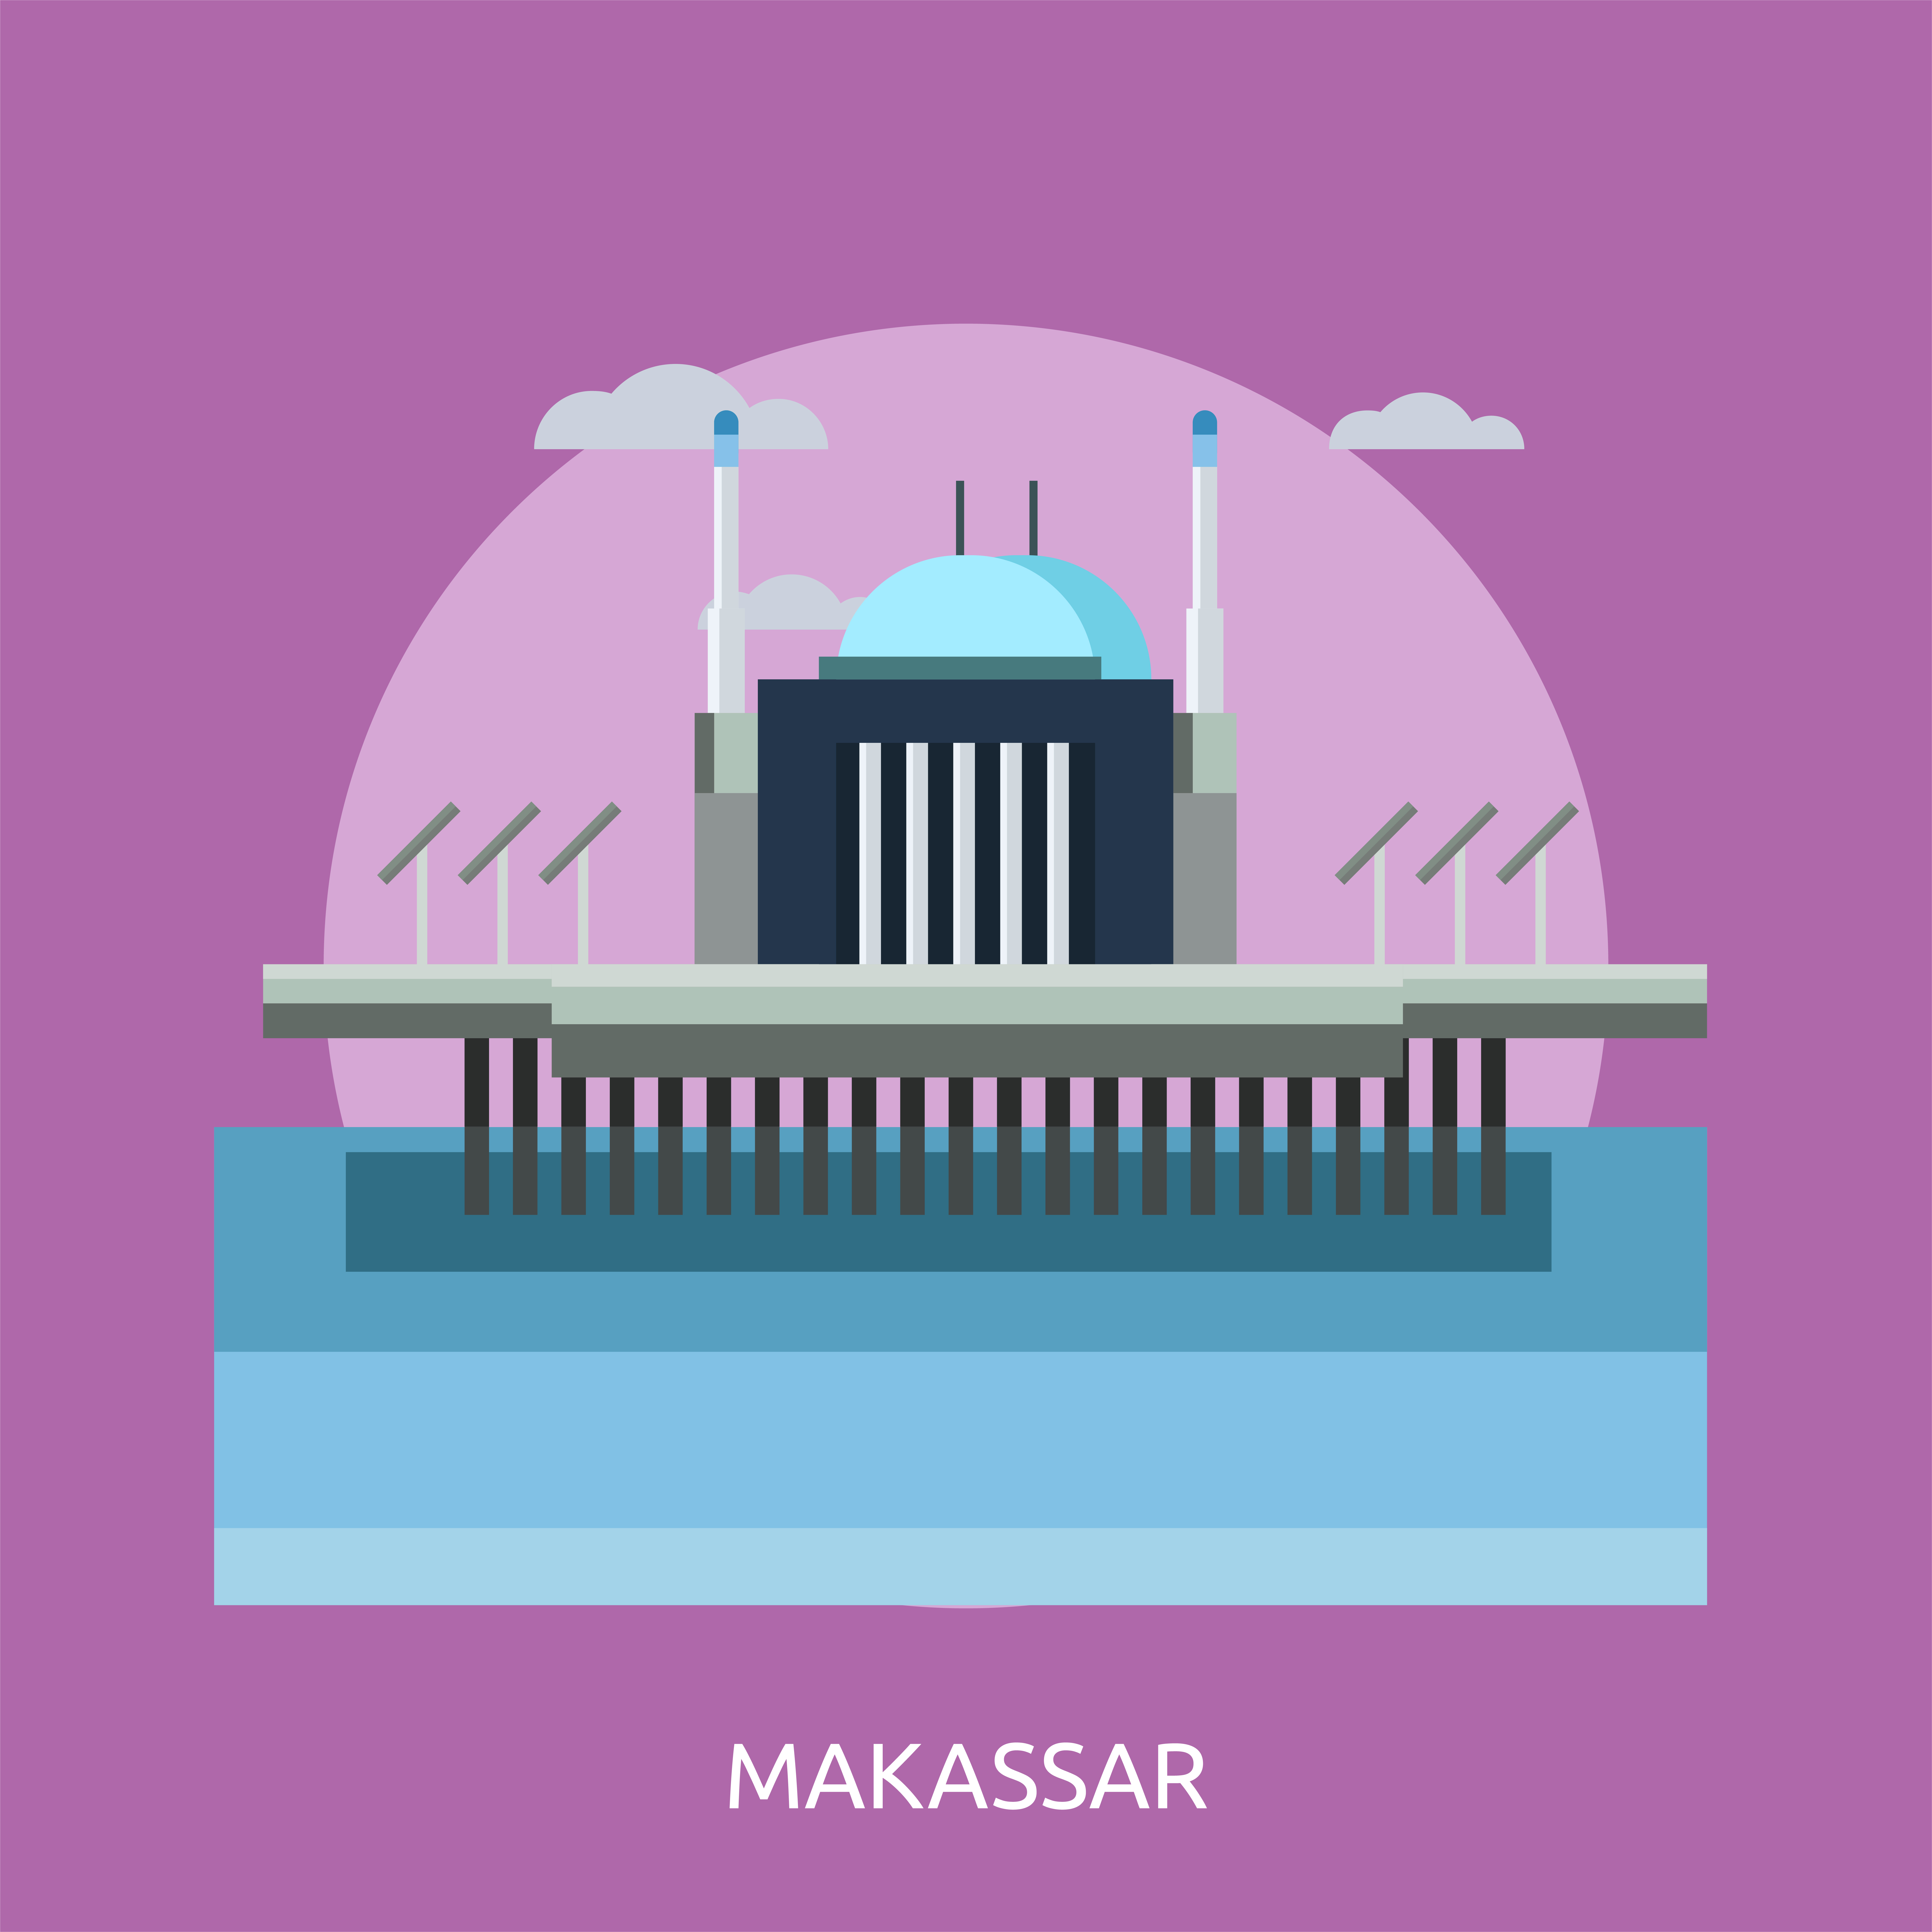 Makassar Conceptual Illustration Design